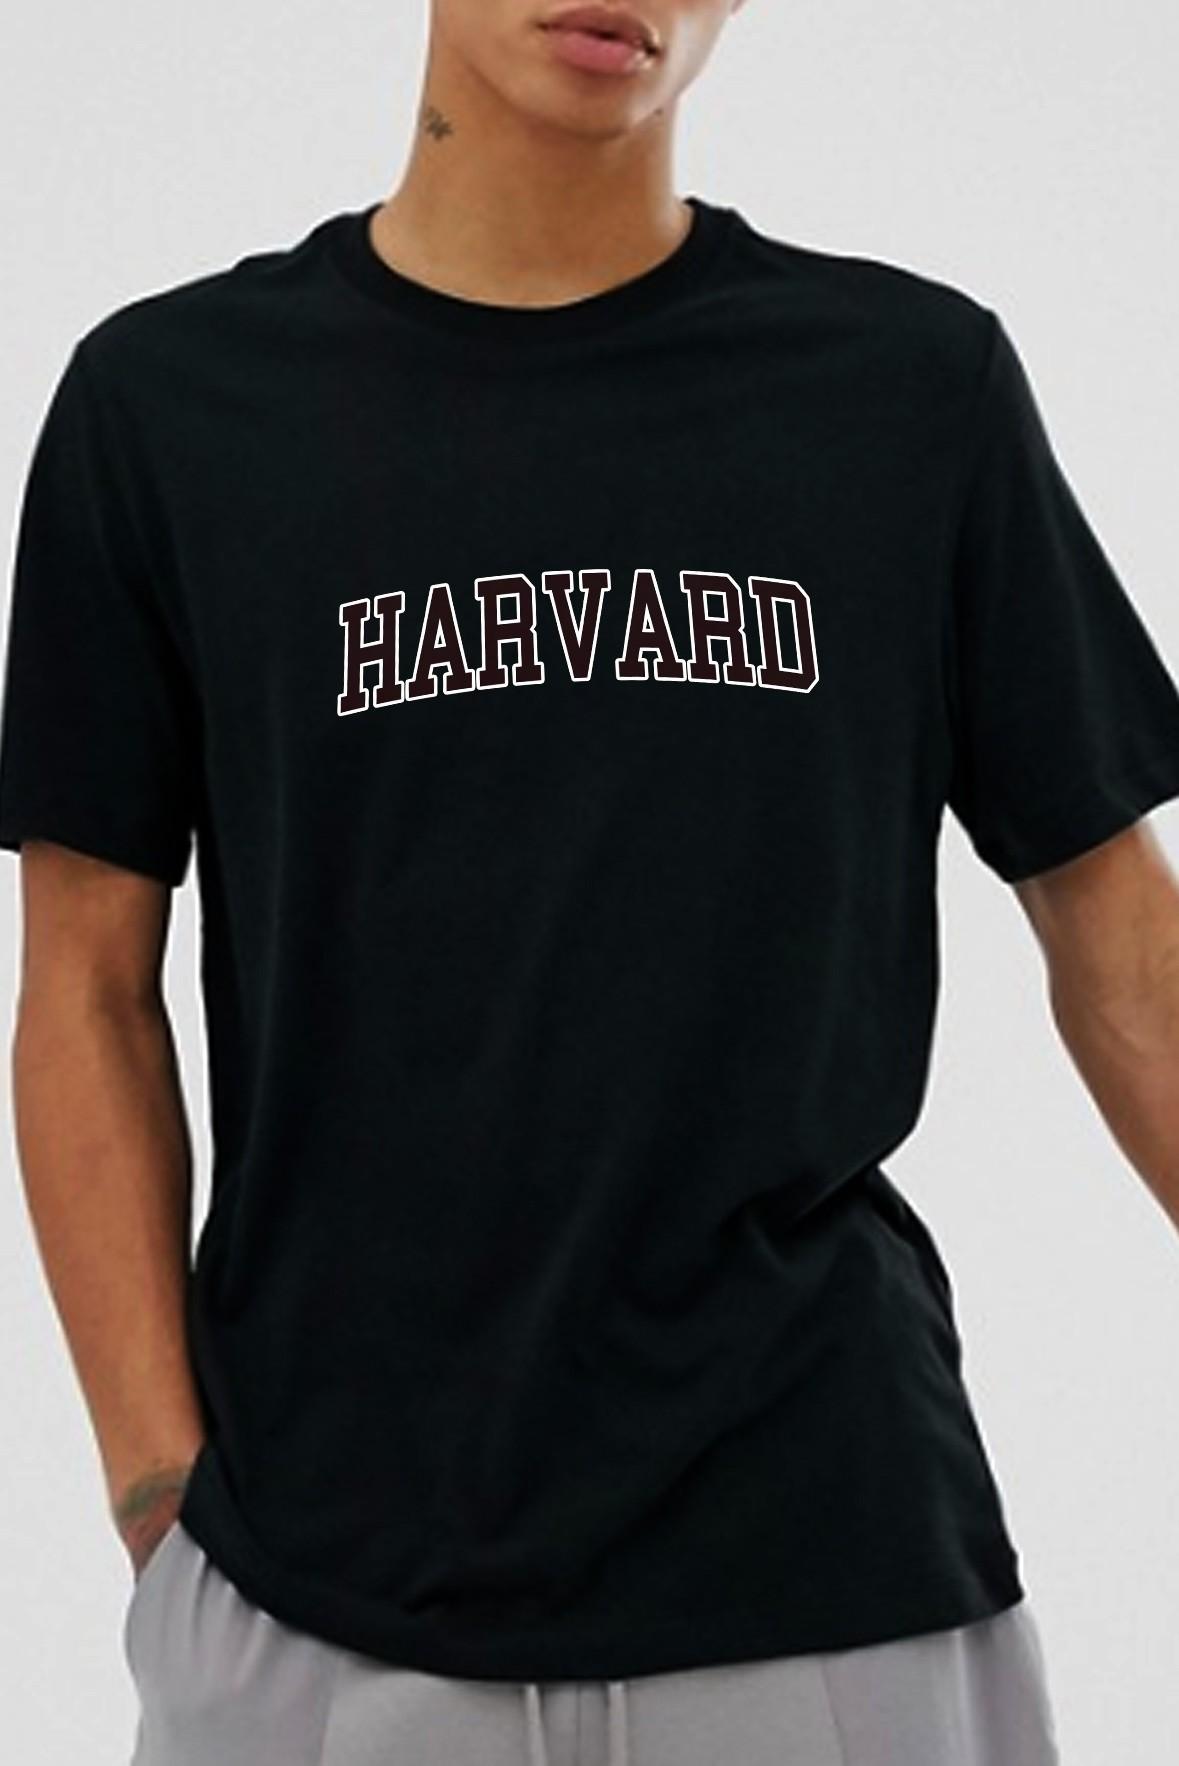 Harvard black